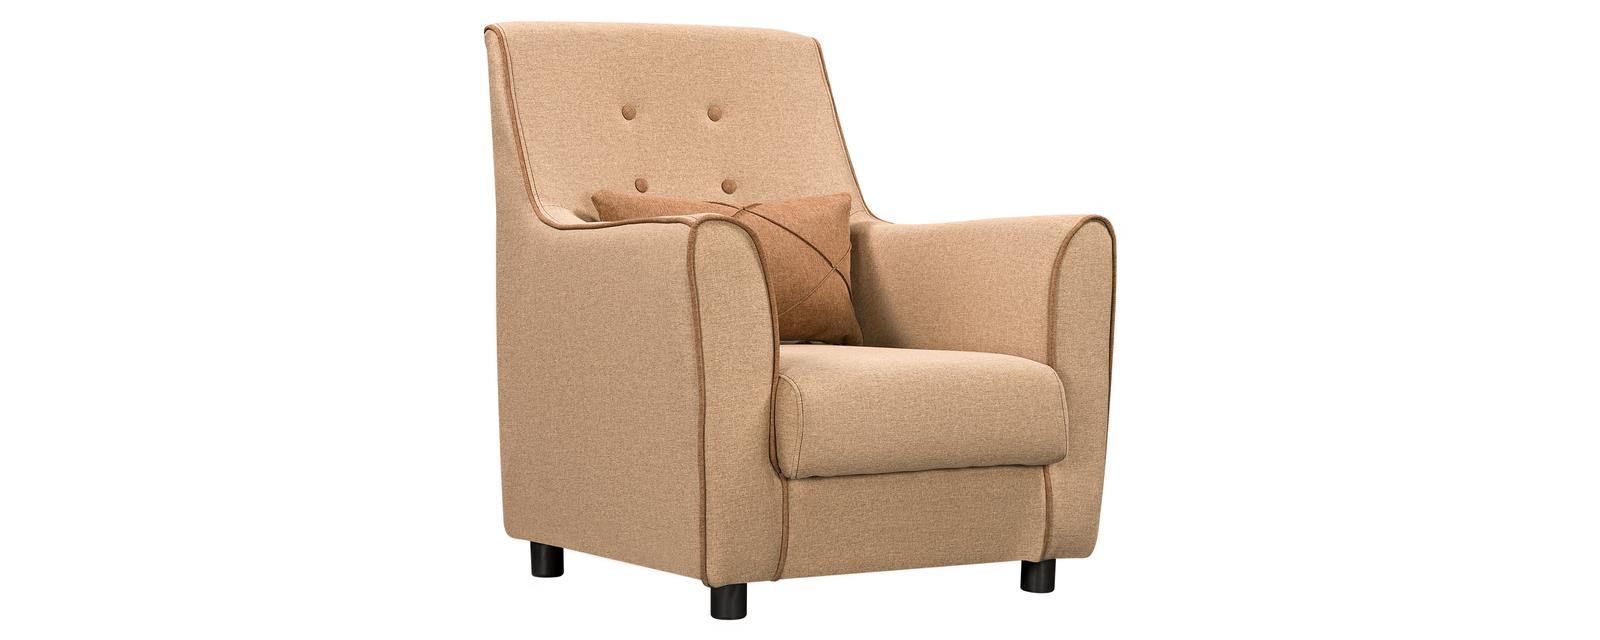 Кресло тканевое HomeMe Френсис AAA0331011